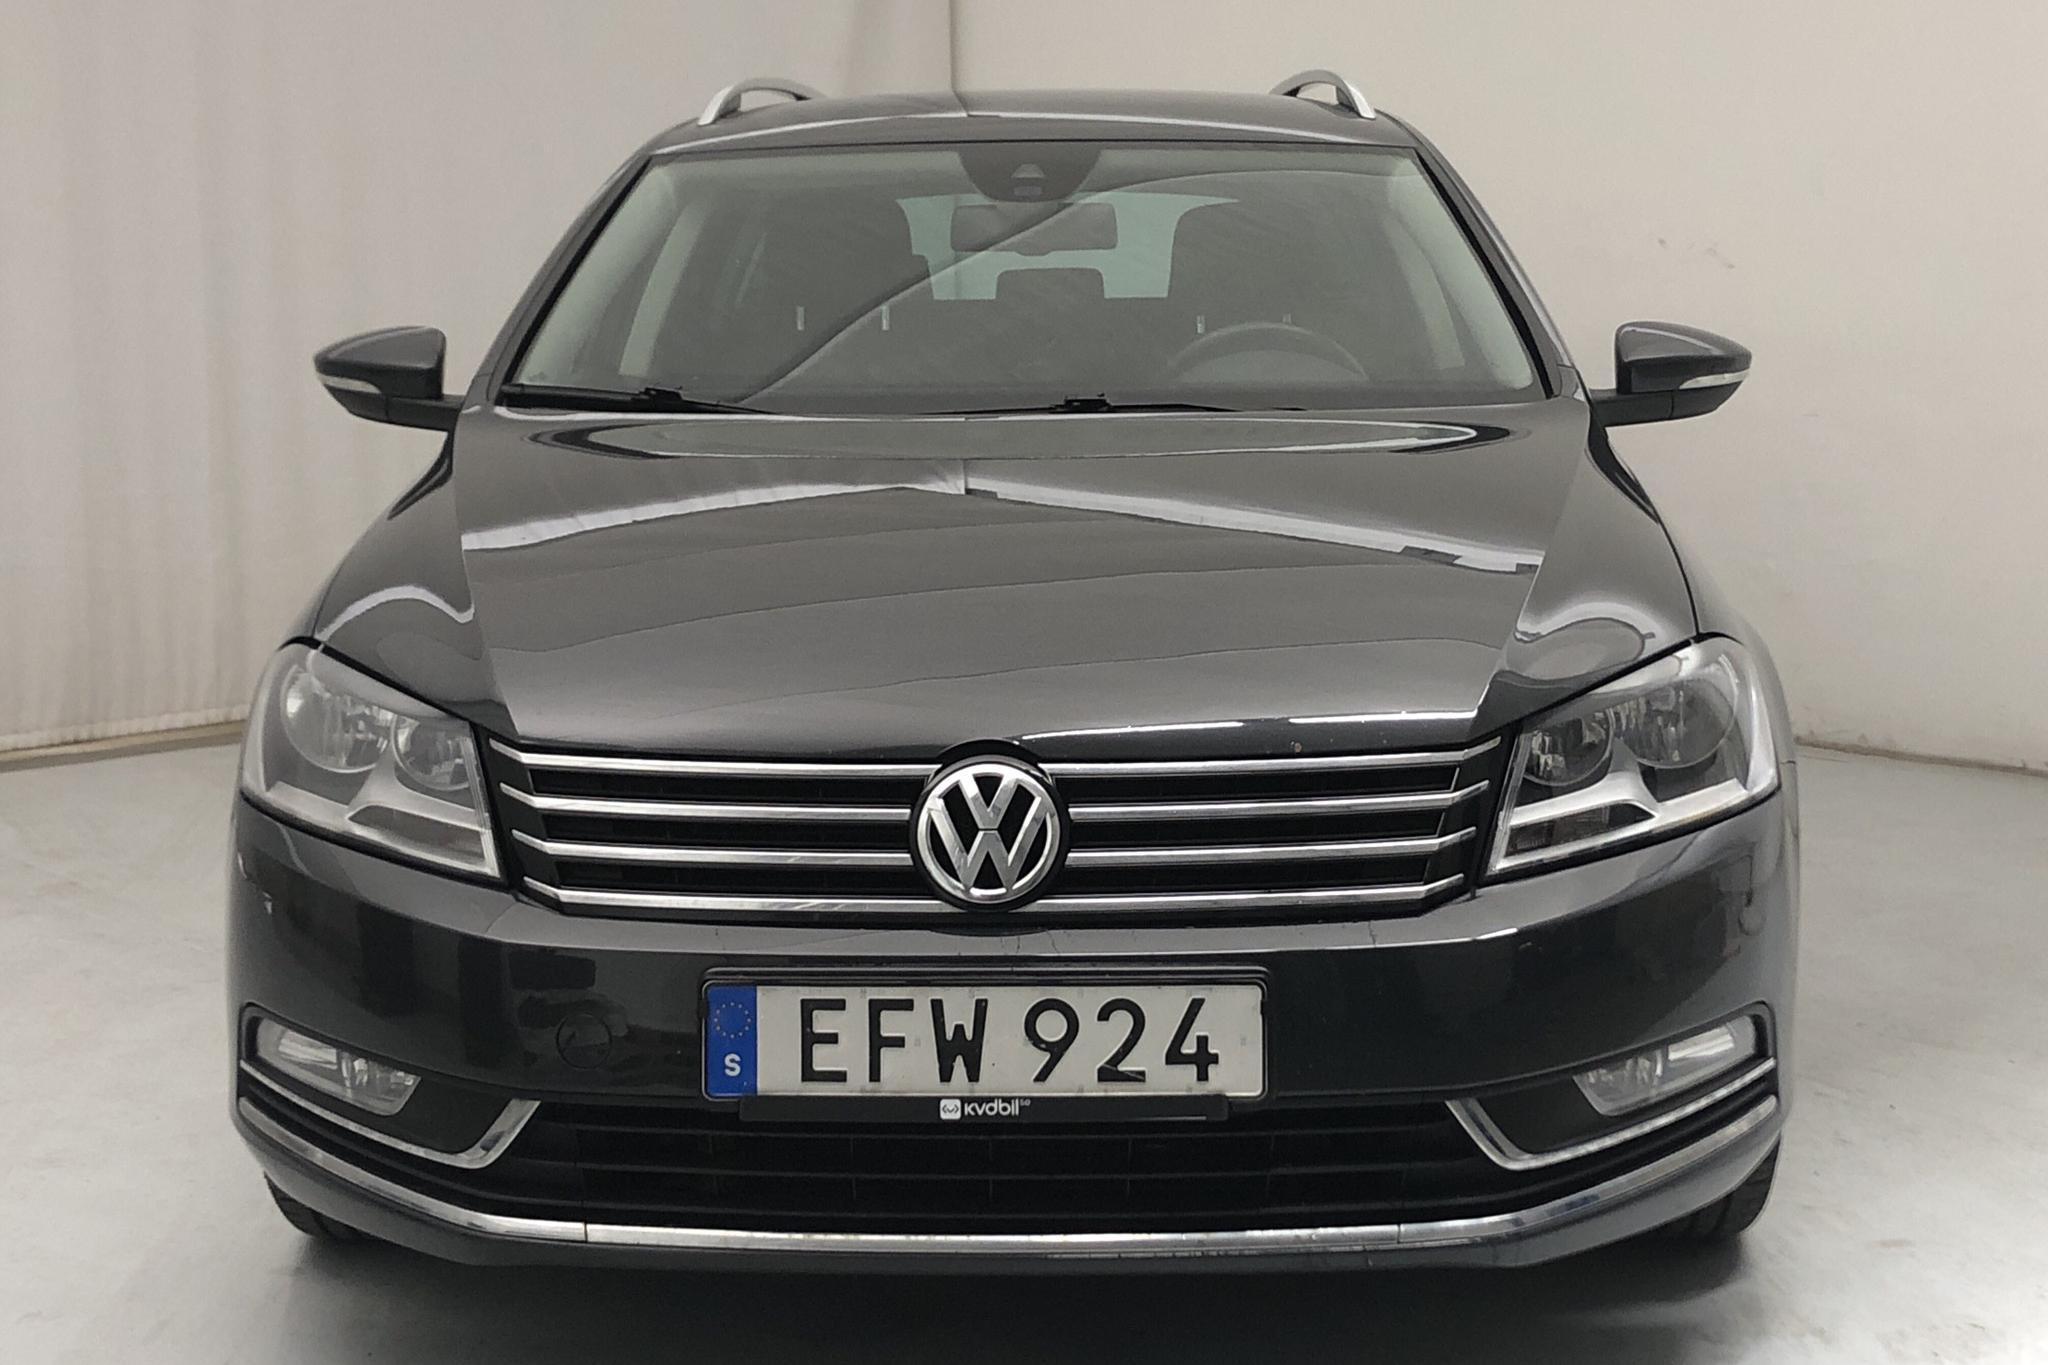 VW Passat 1.4 TSI EcoFuel Variant (150hk) - 18 686 mil - Automat - Dark Grey - 2014